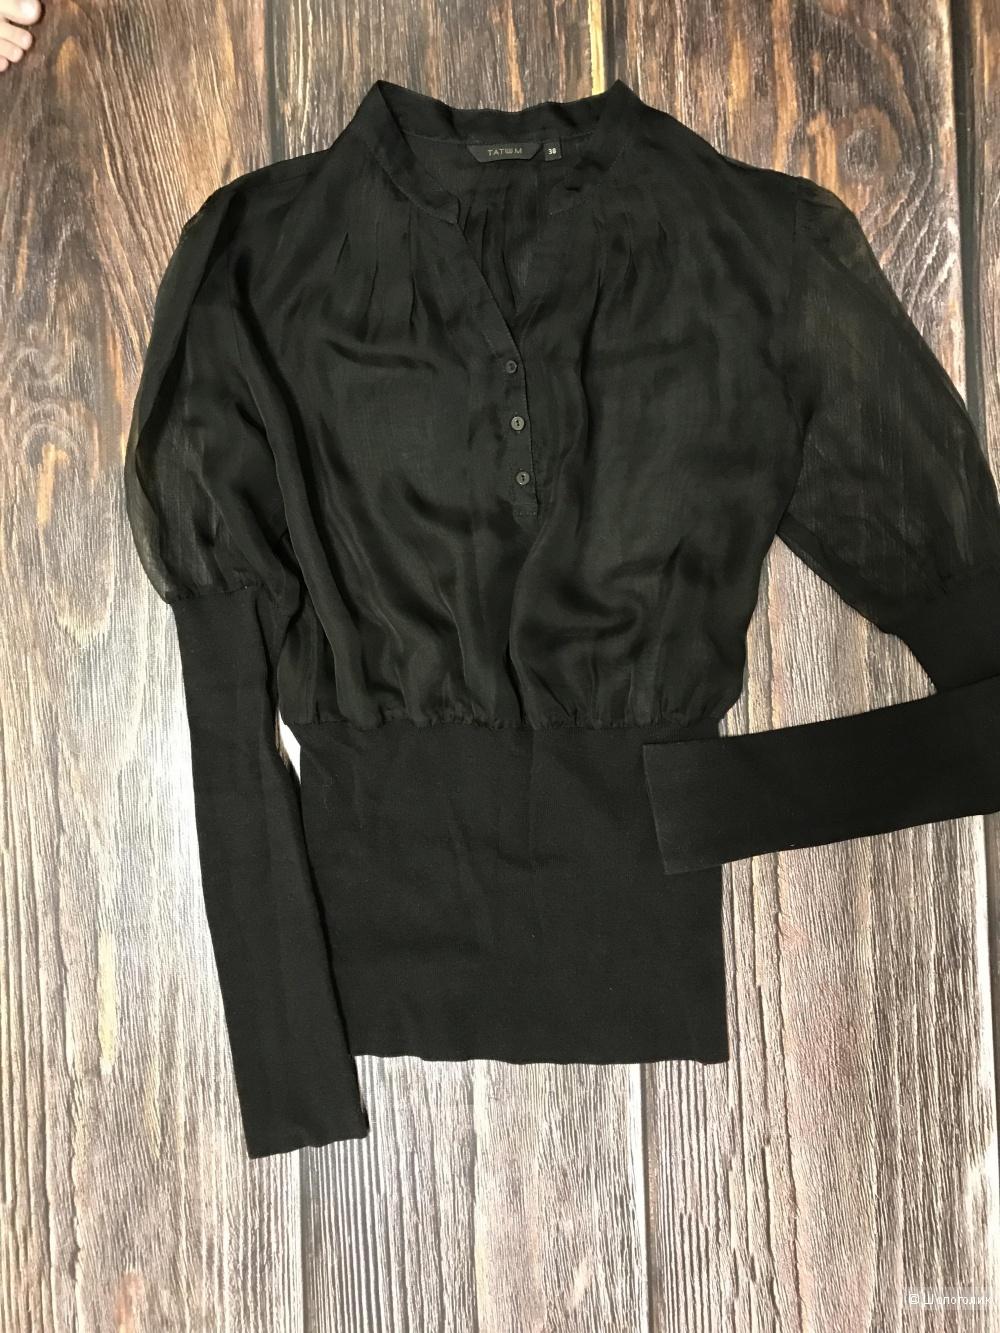 Блуза Tatuum , размер 38 (s)